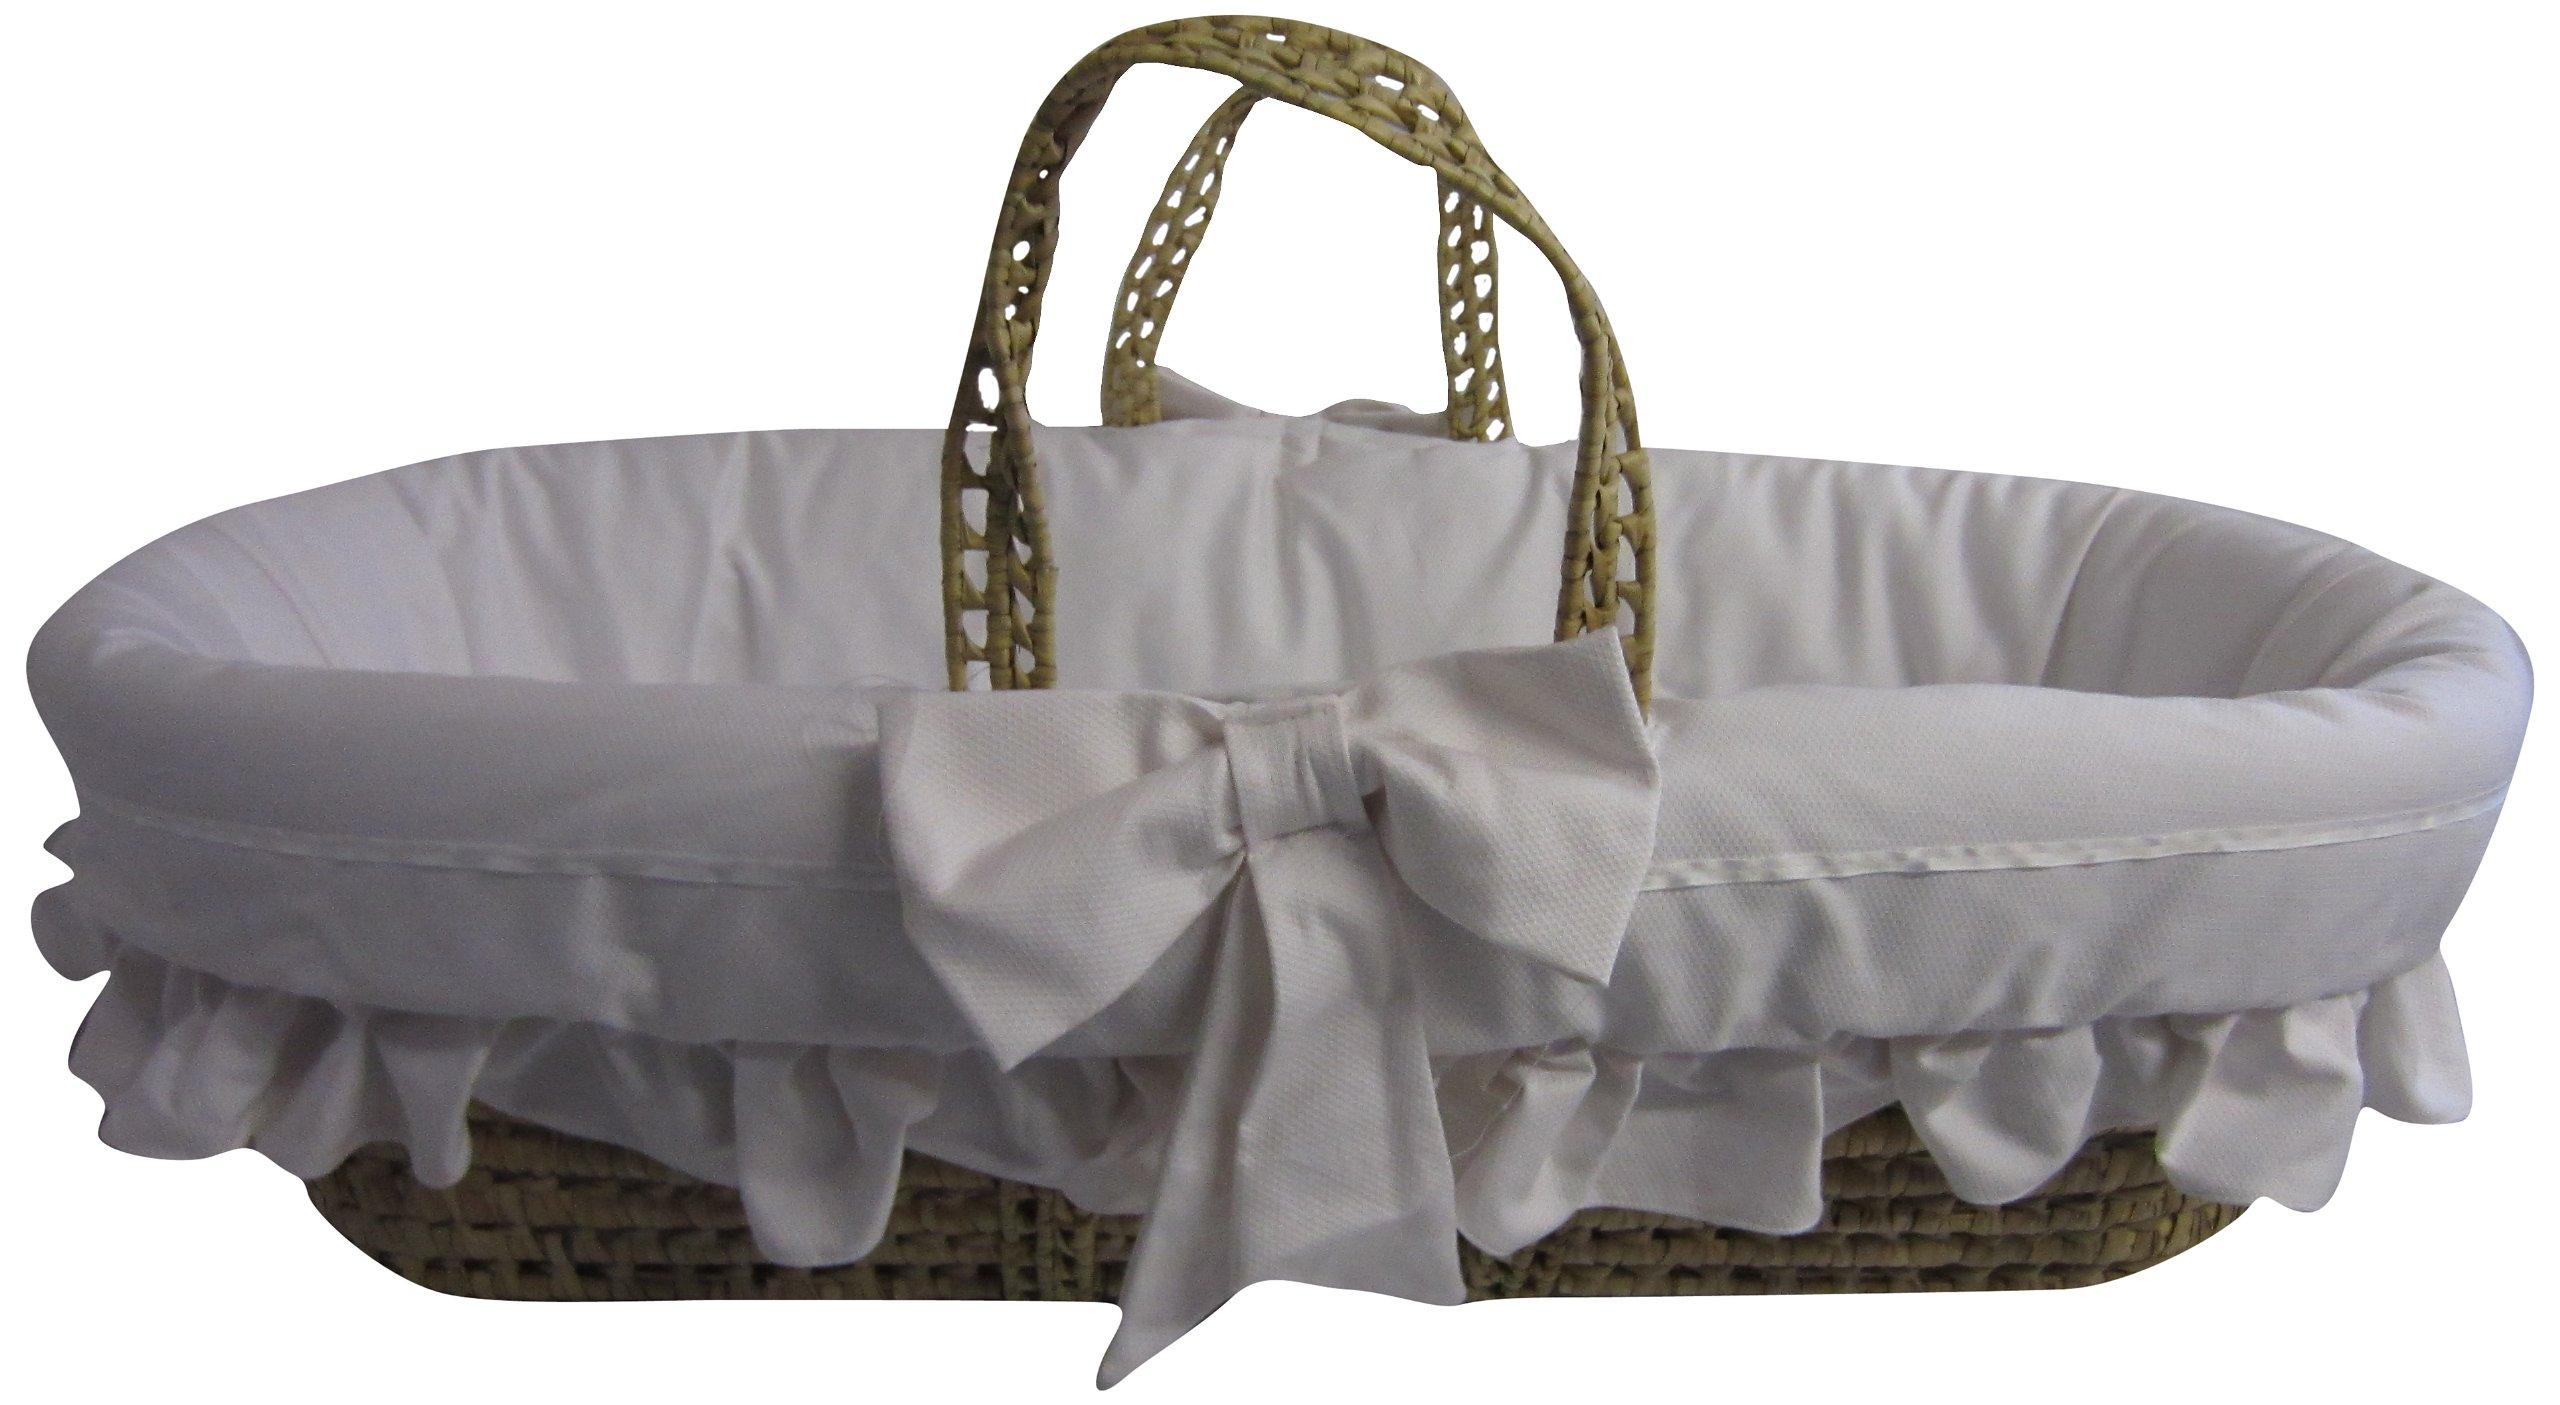 Baby Doll Bedding Satin Trim Moses Basket, White by BabyDoll Bedding